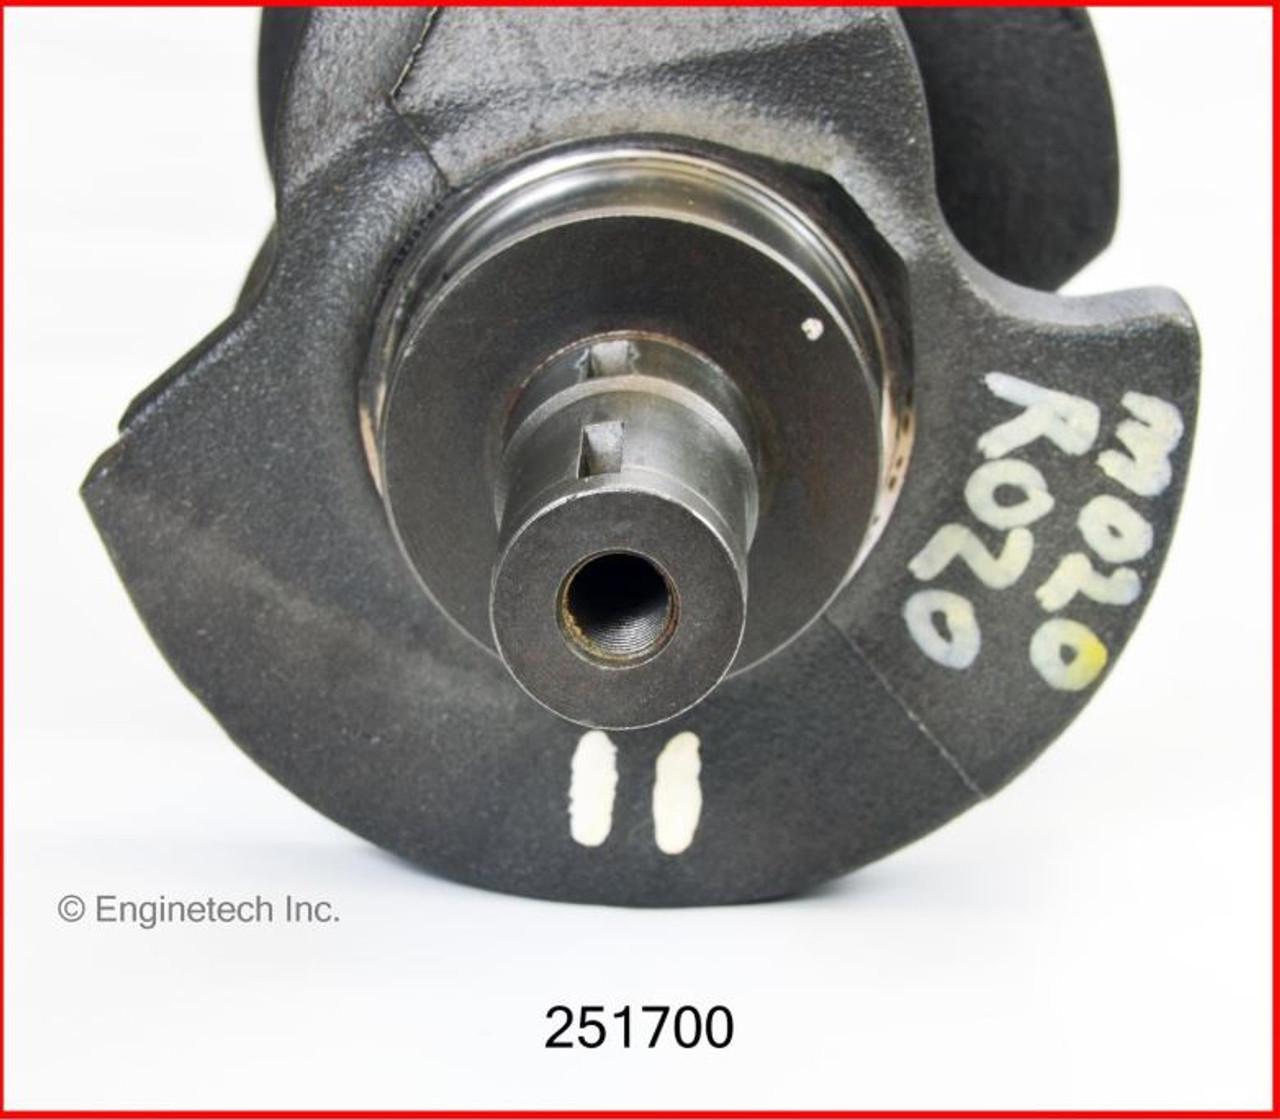 1986 American Motors Eagle 4.2L Engine Crankshaft Kit 251700 -205